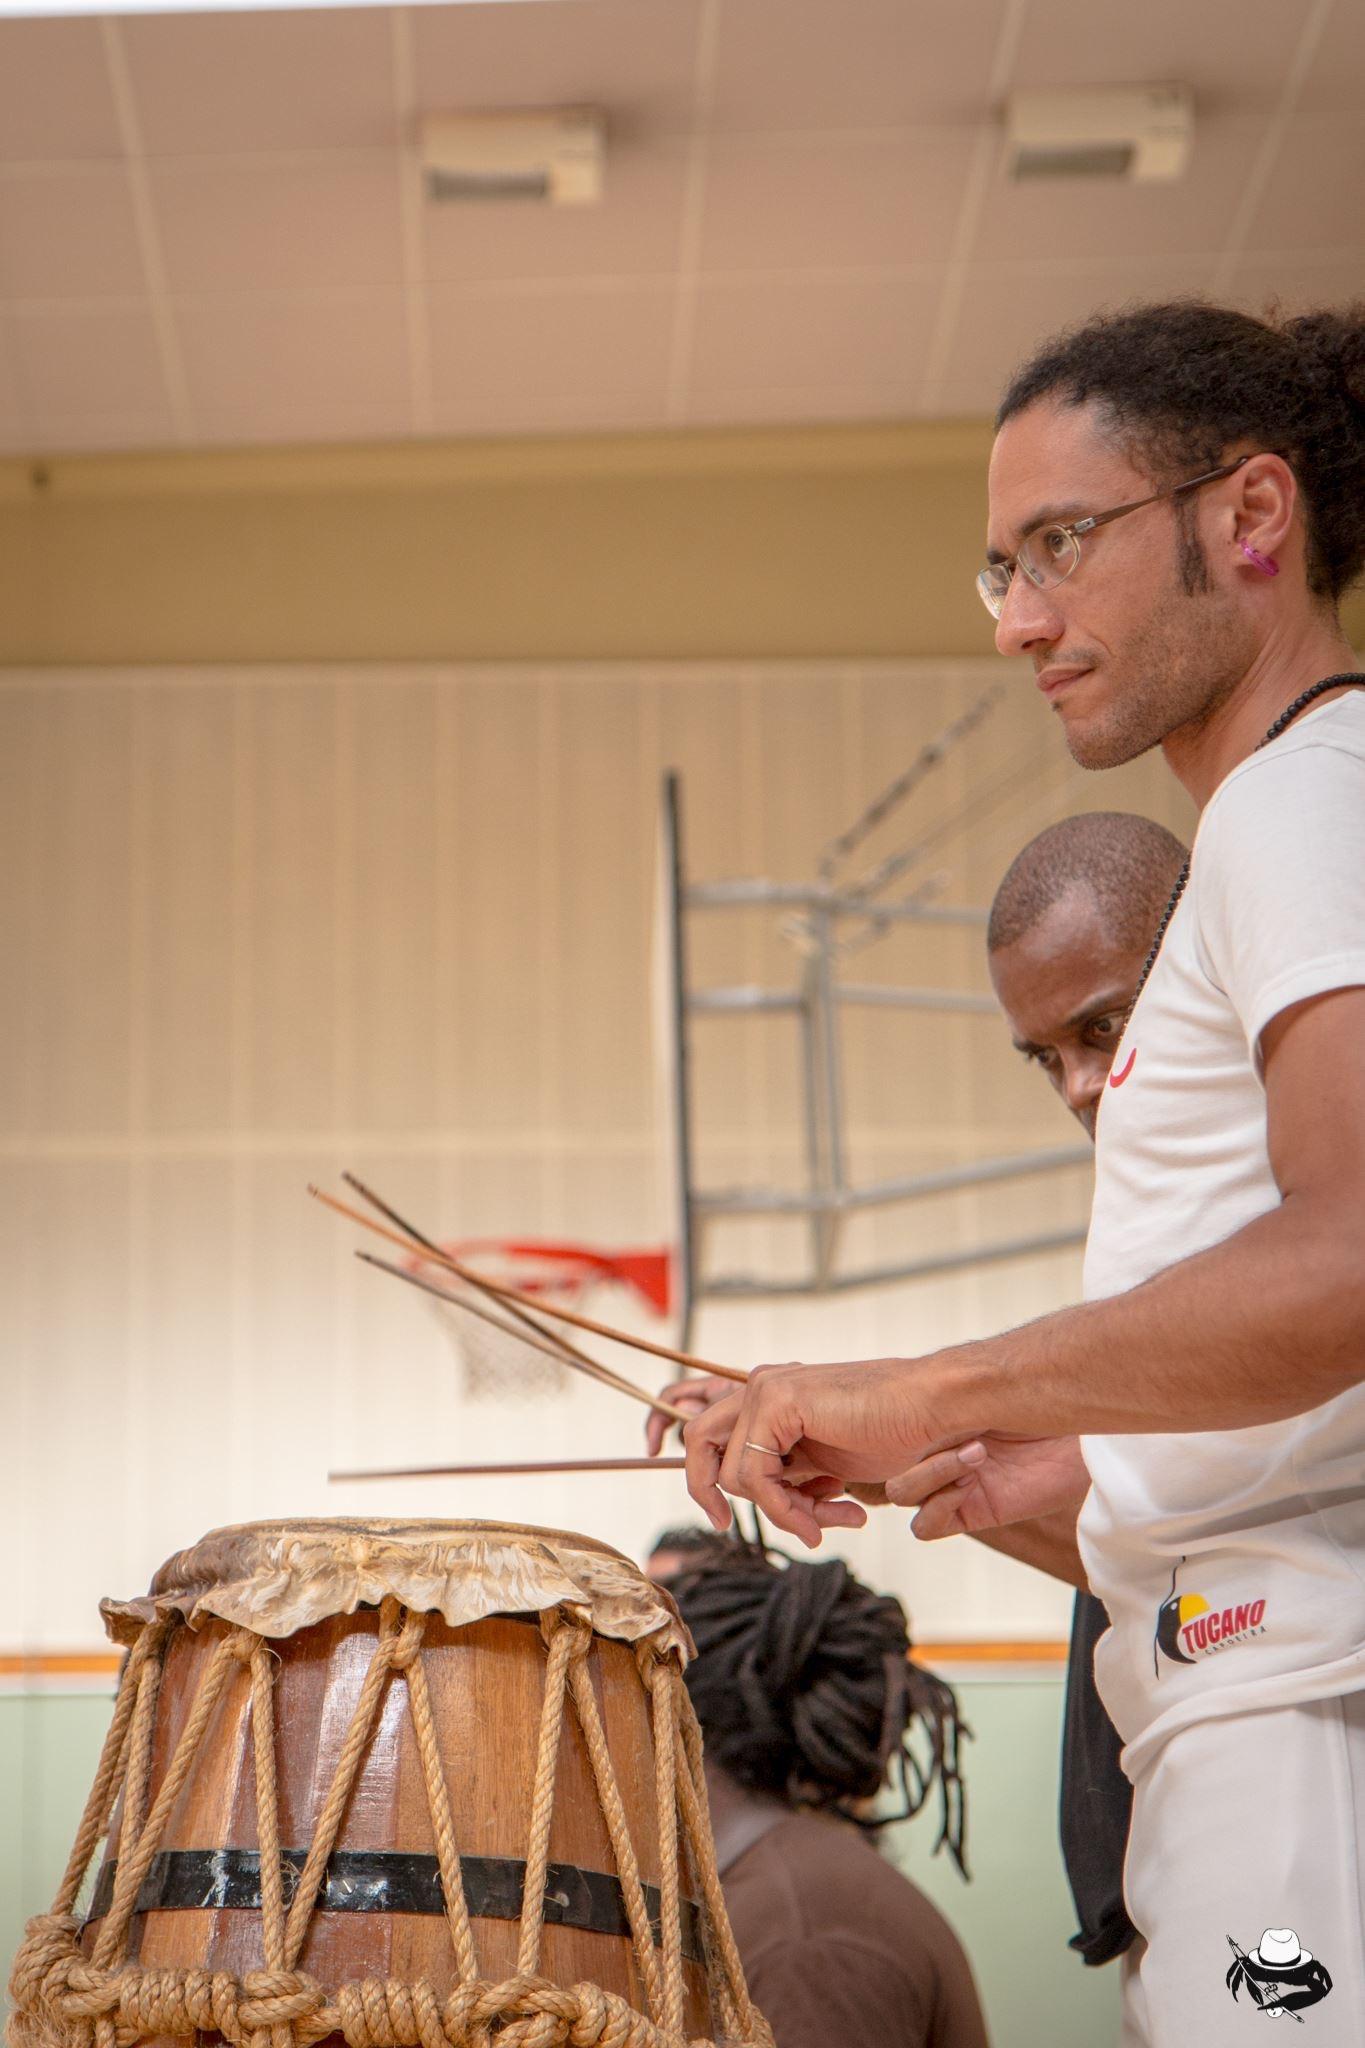 Percussions - Professeur Bambino (CAPOEIRA BIARRITZ SENZALA)